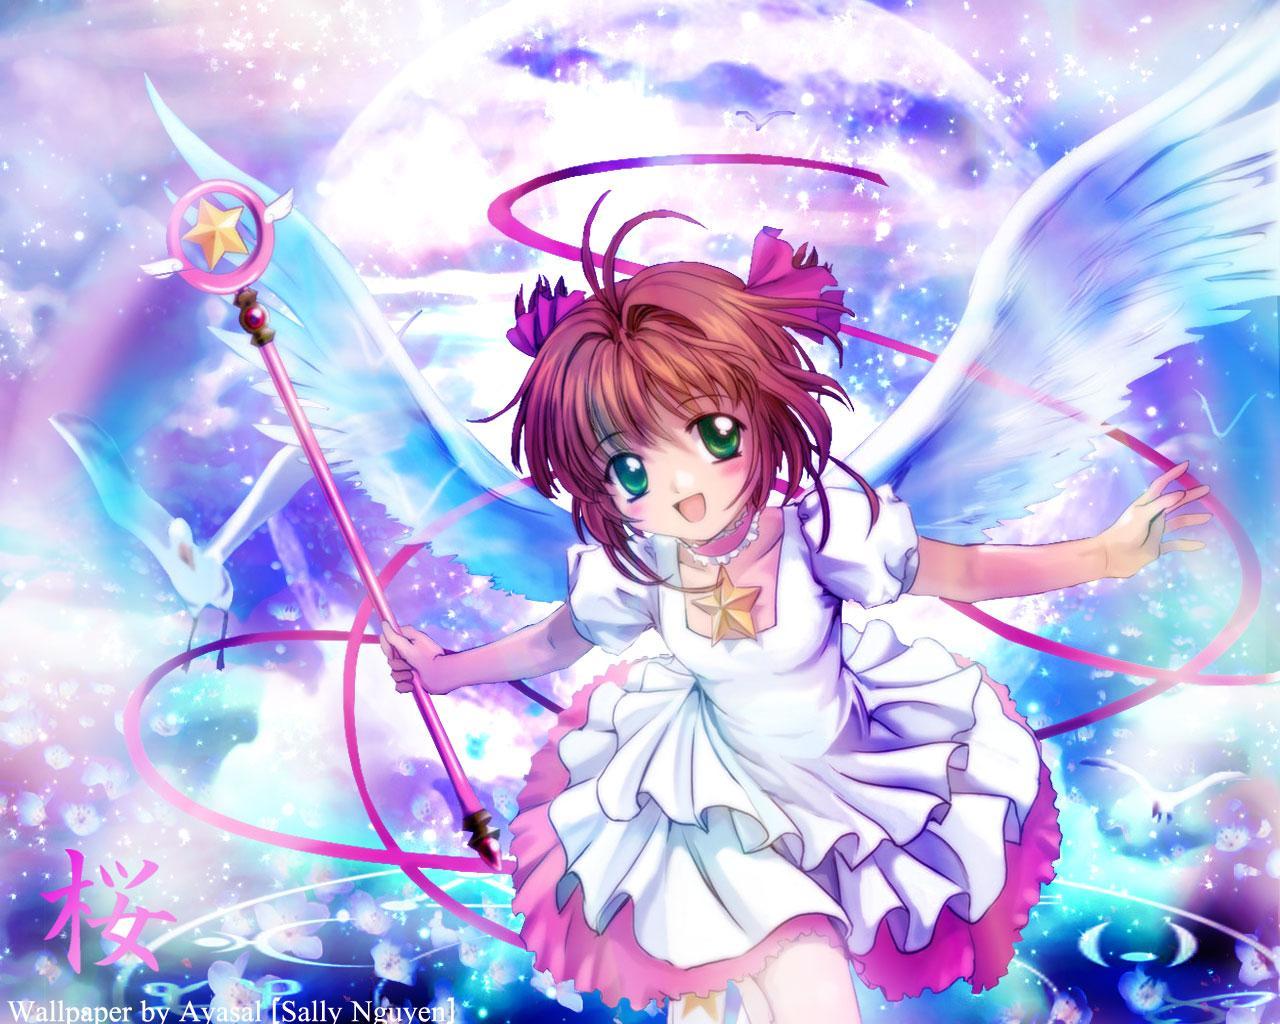 Sakura Card Captor wallpaper 11